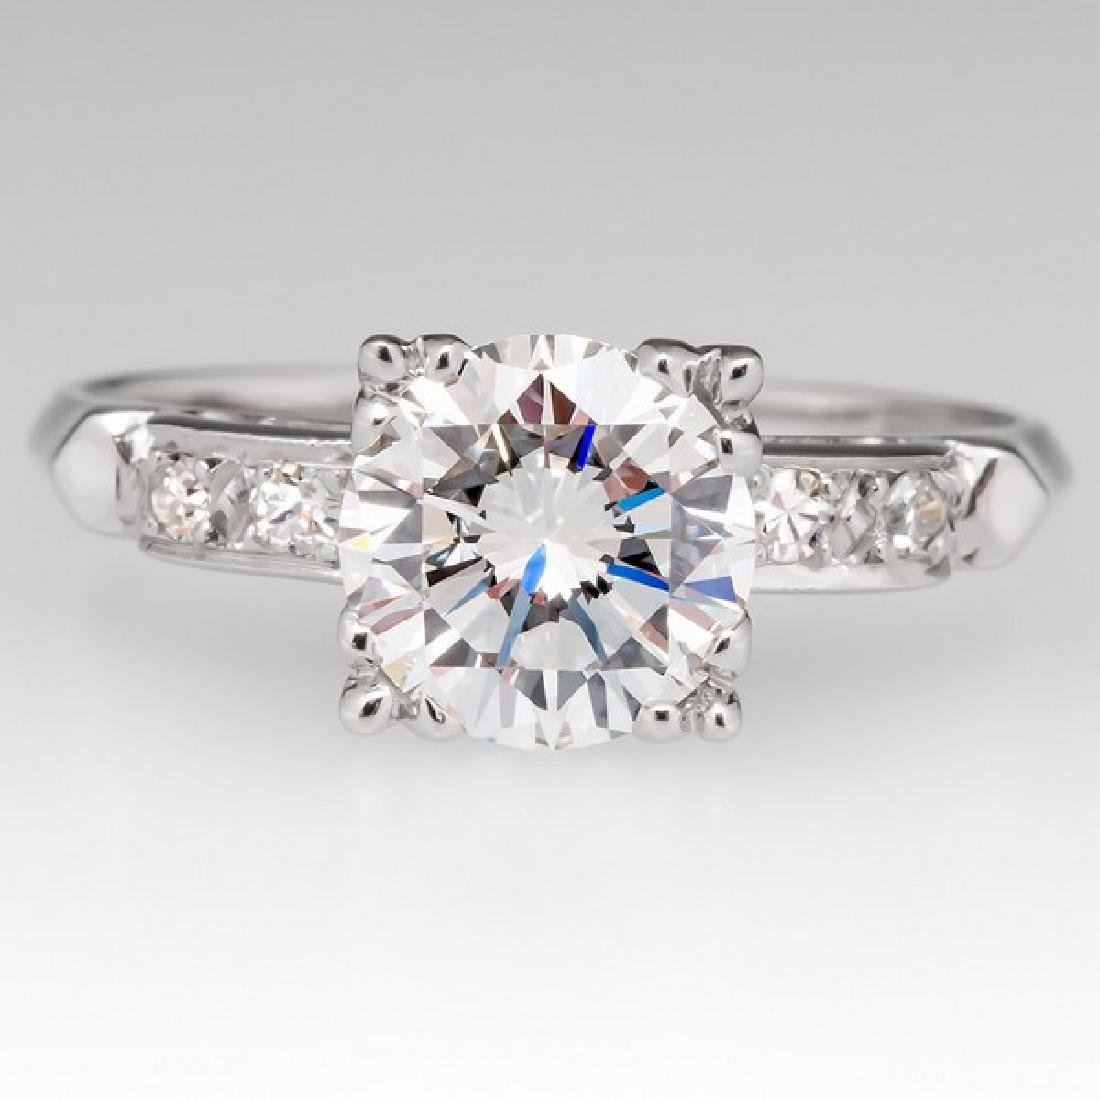 VINTAGE PLATINUM GIA DIAMOND ENGAGEMENT RING